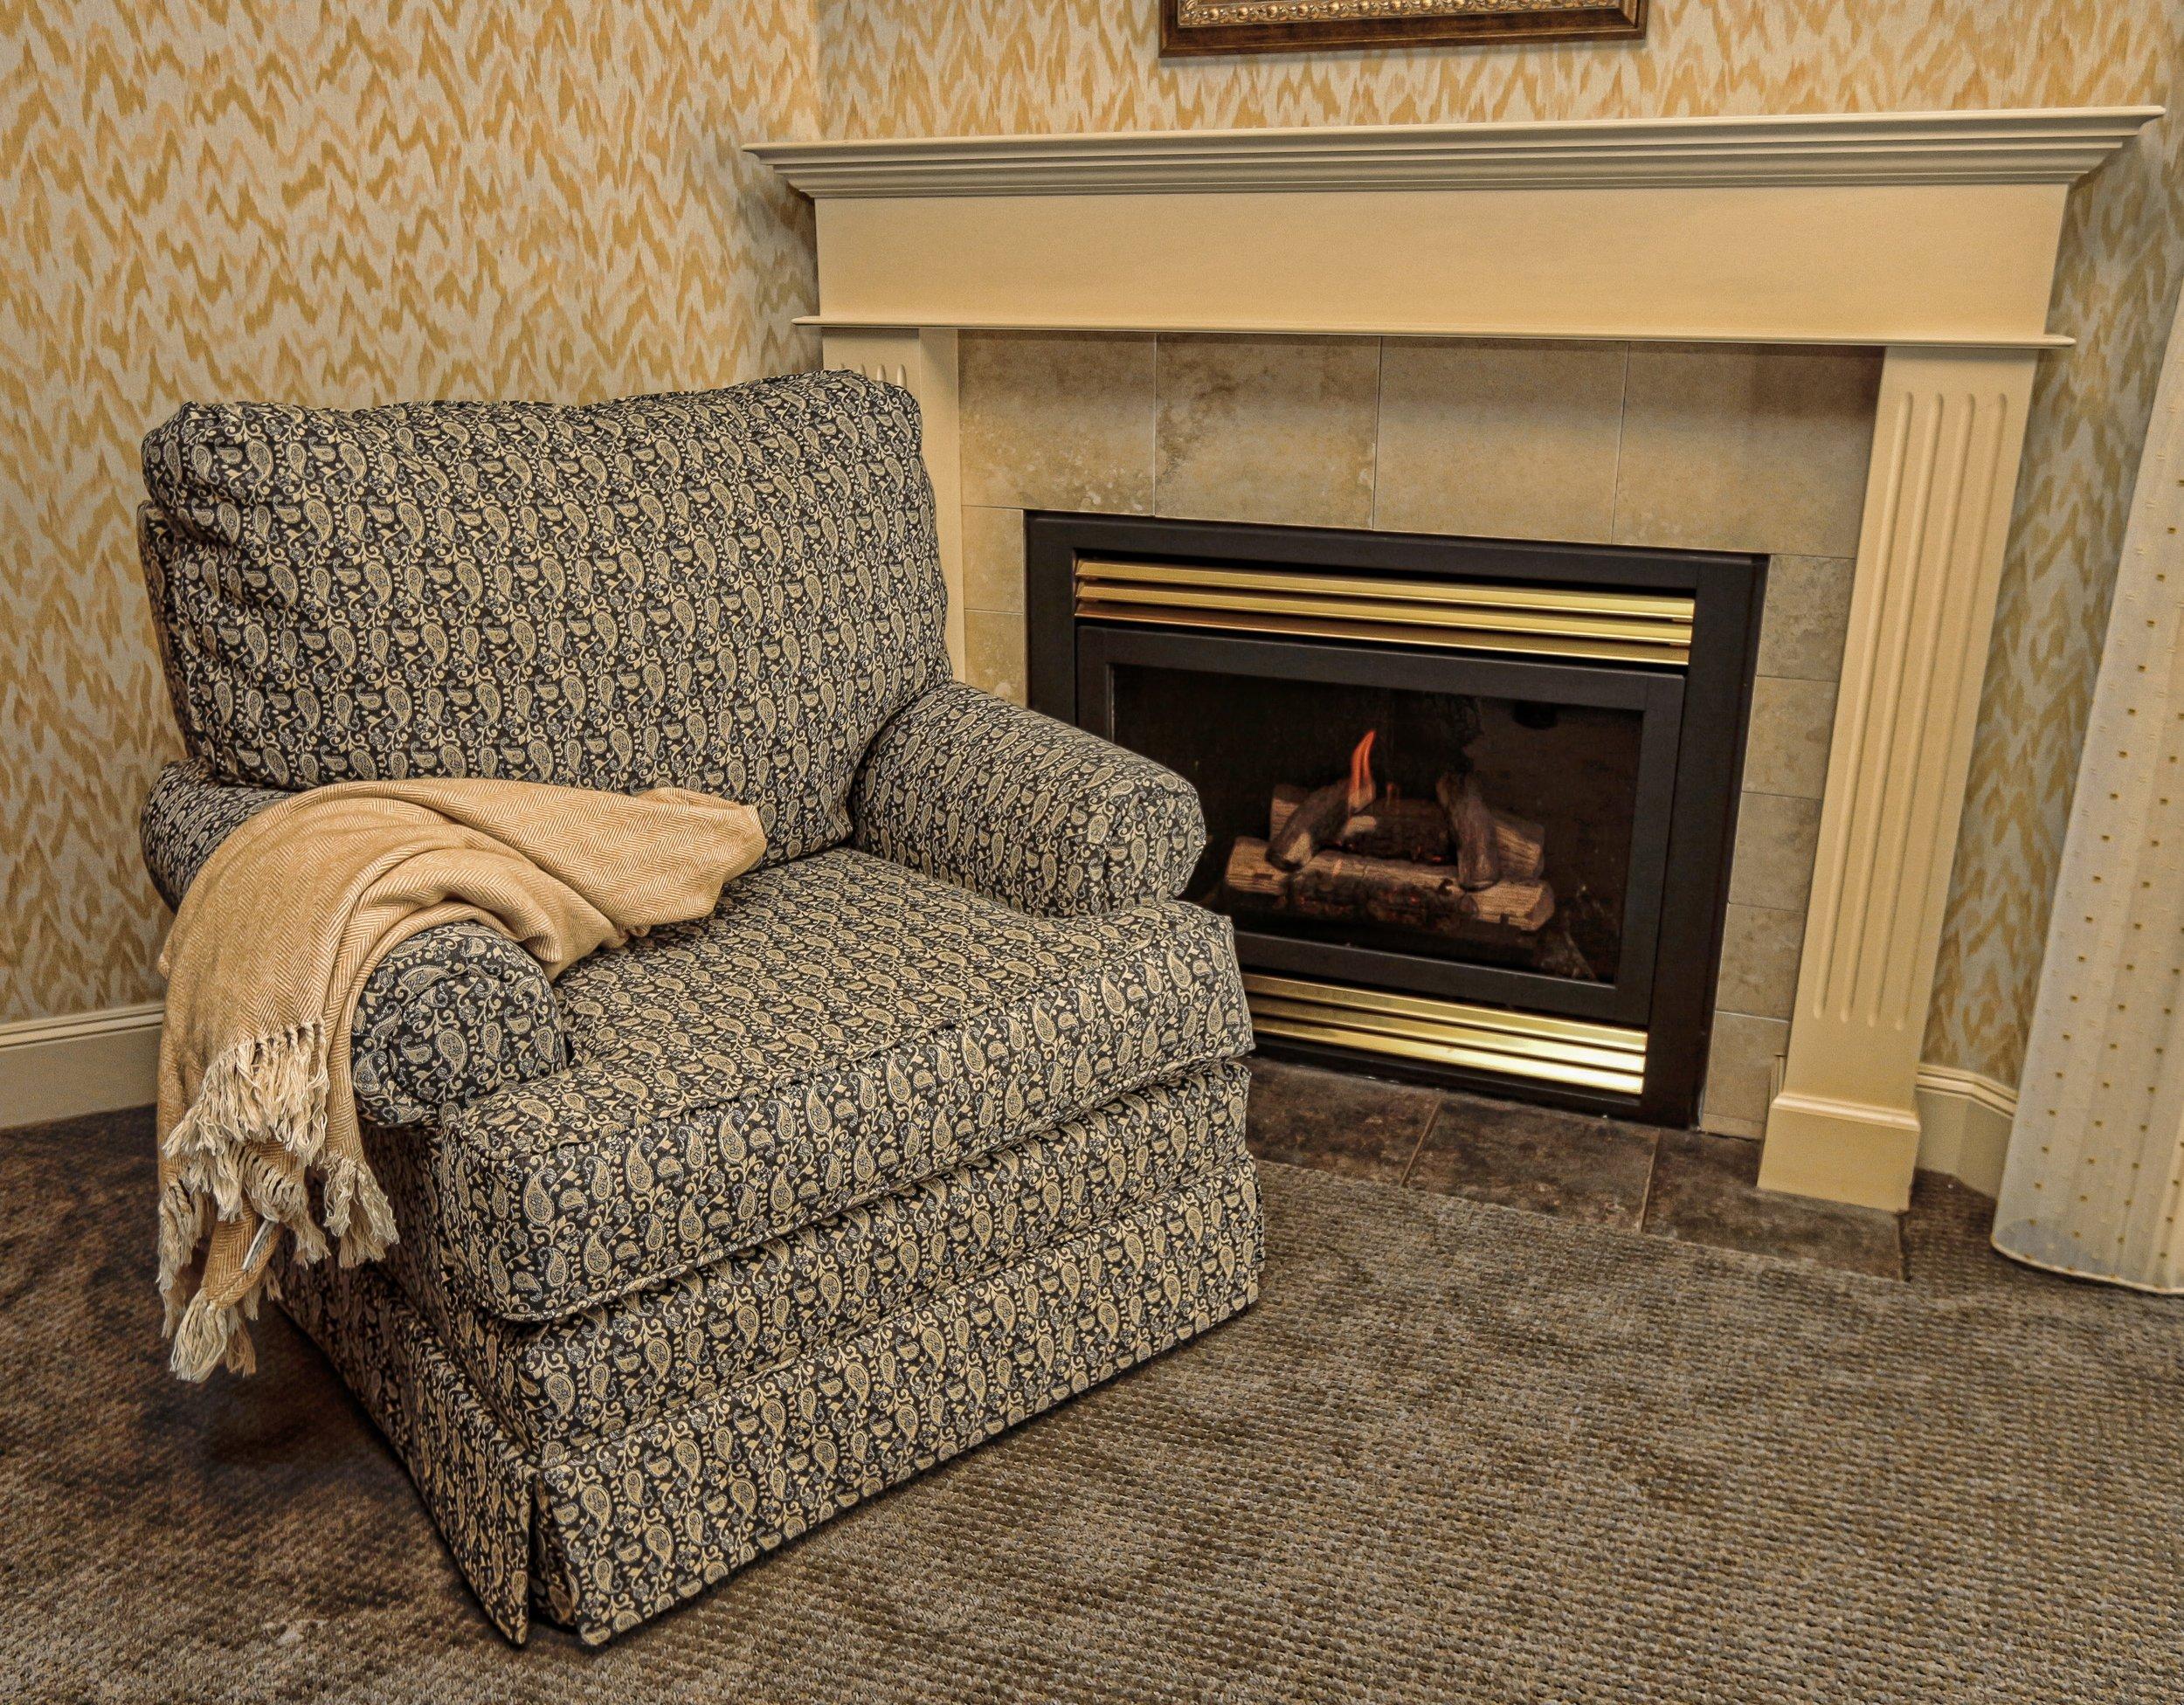 FVI Chair by the fire.jpg